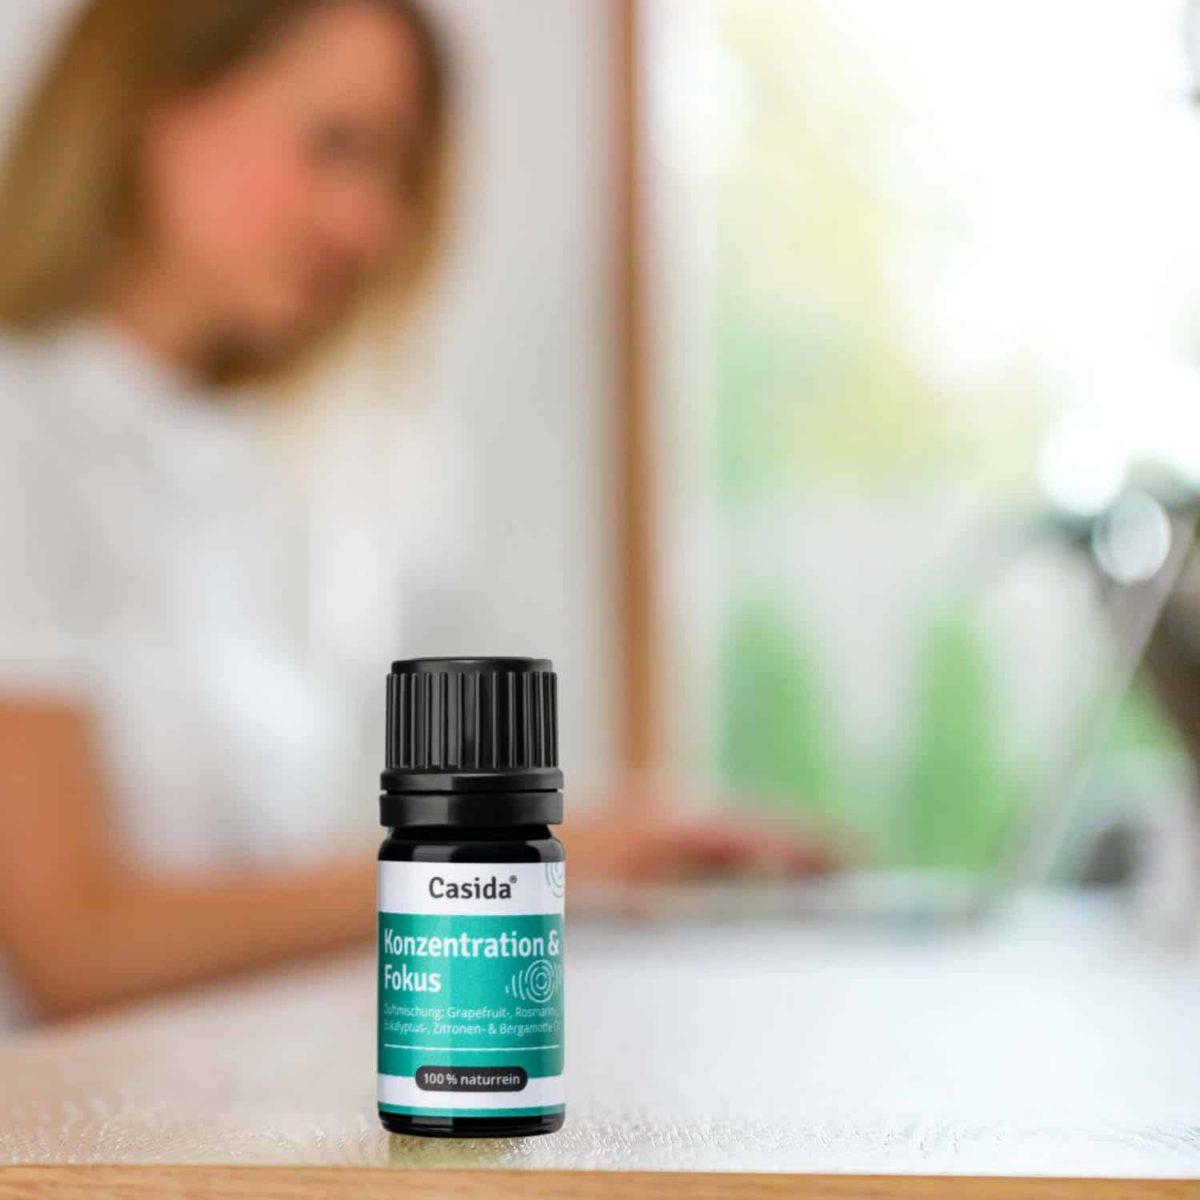 Casida Focusing Aroma-Blend Konzentration & Fokus - 5 ml 17377200 PZN Apotheke Energie Gedächtnis Aromatherapie Aromapflege Aromaschmuck Diffuser3